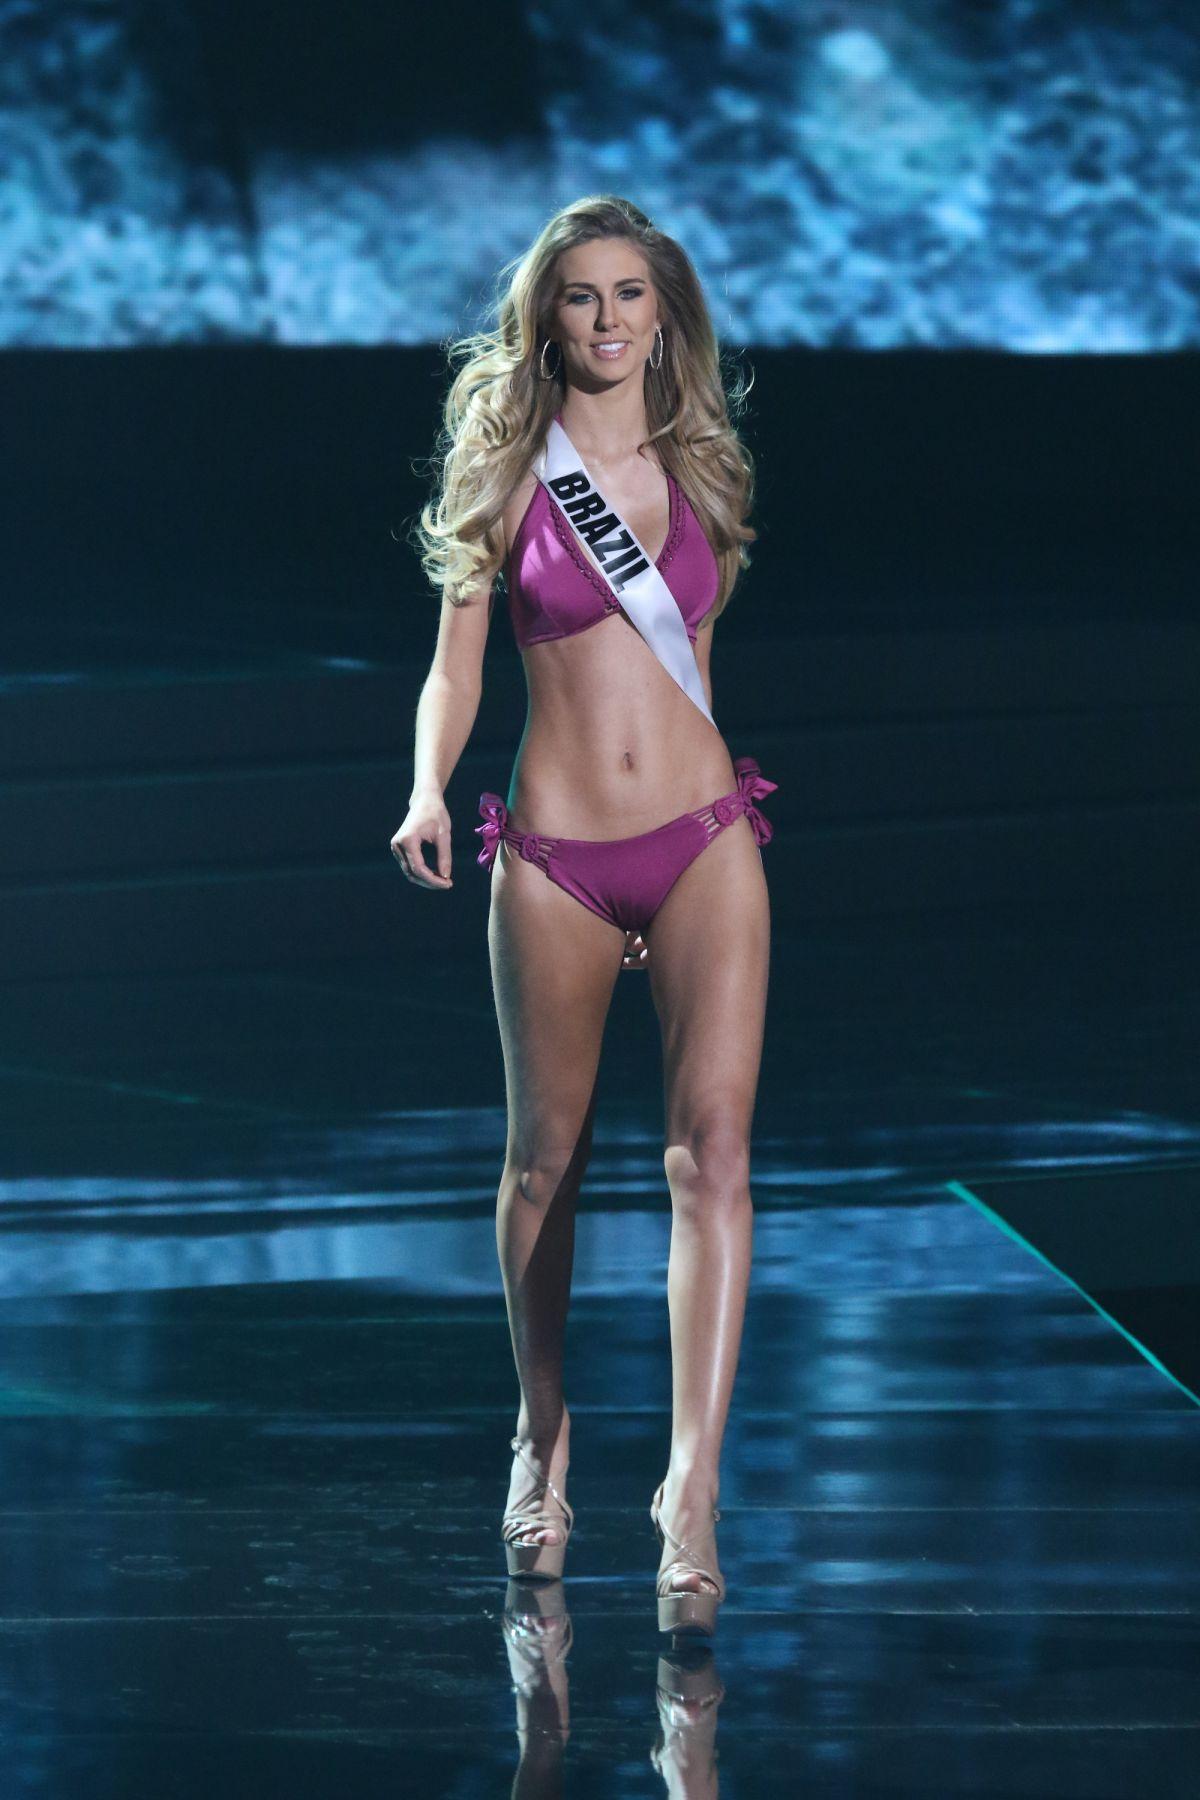 Marthina brandt miss universe 2015 preliminary round 12 16 2015